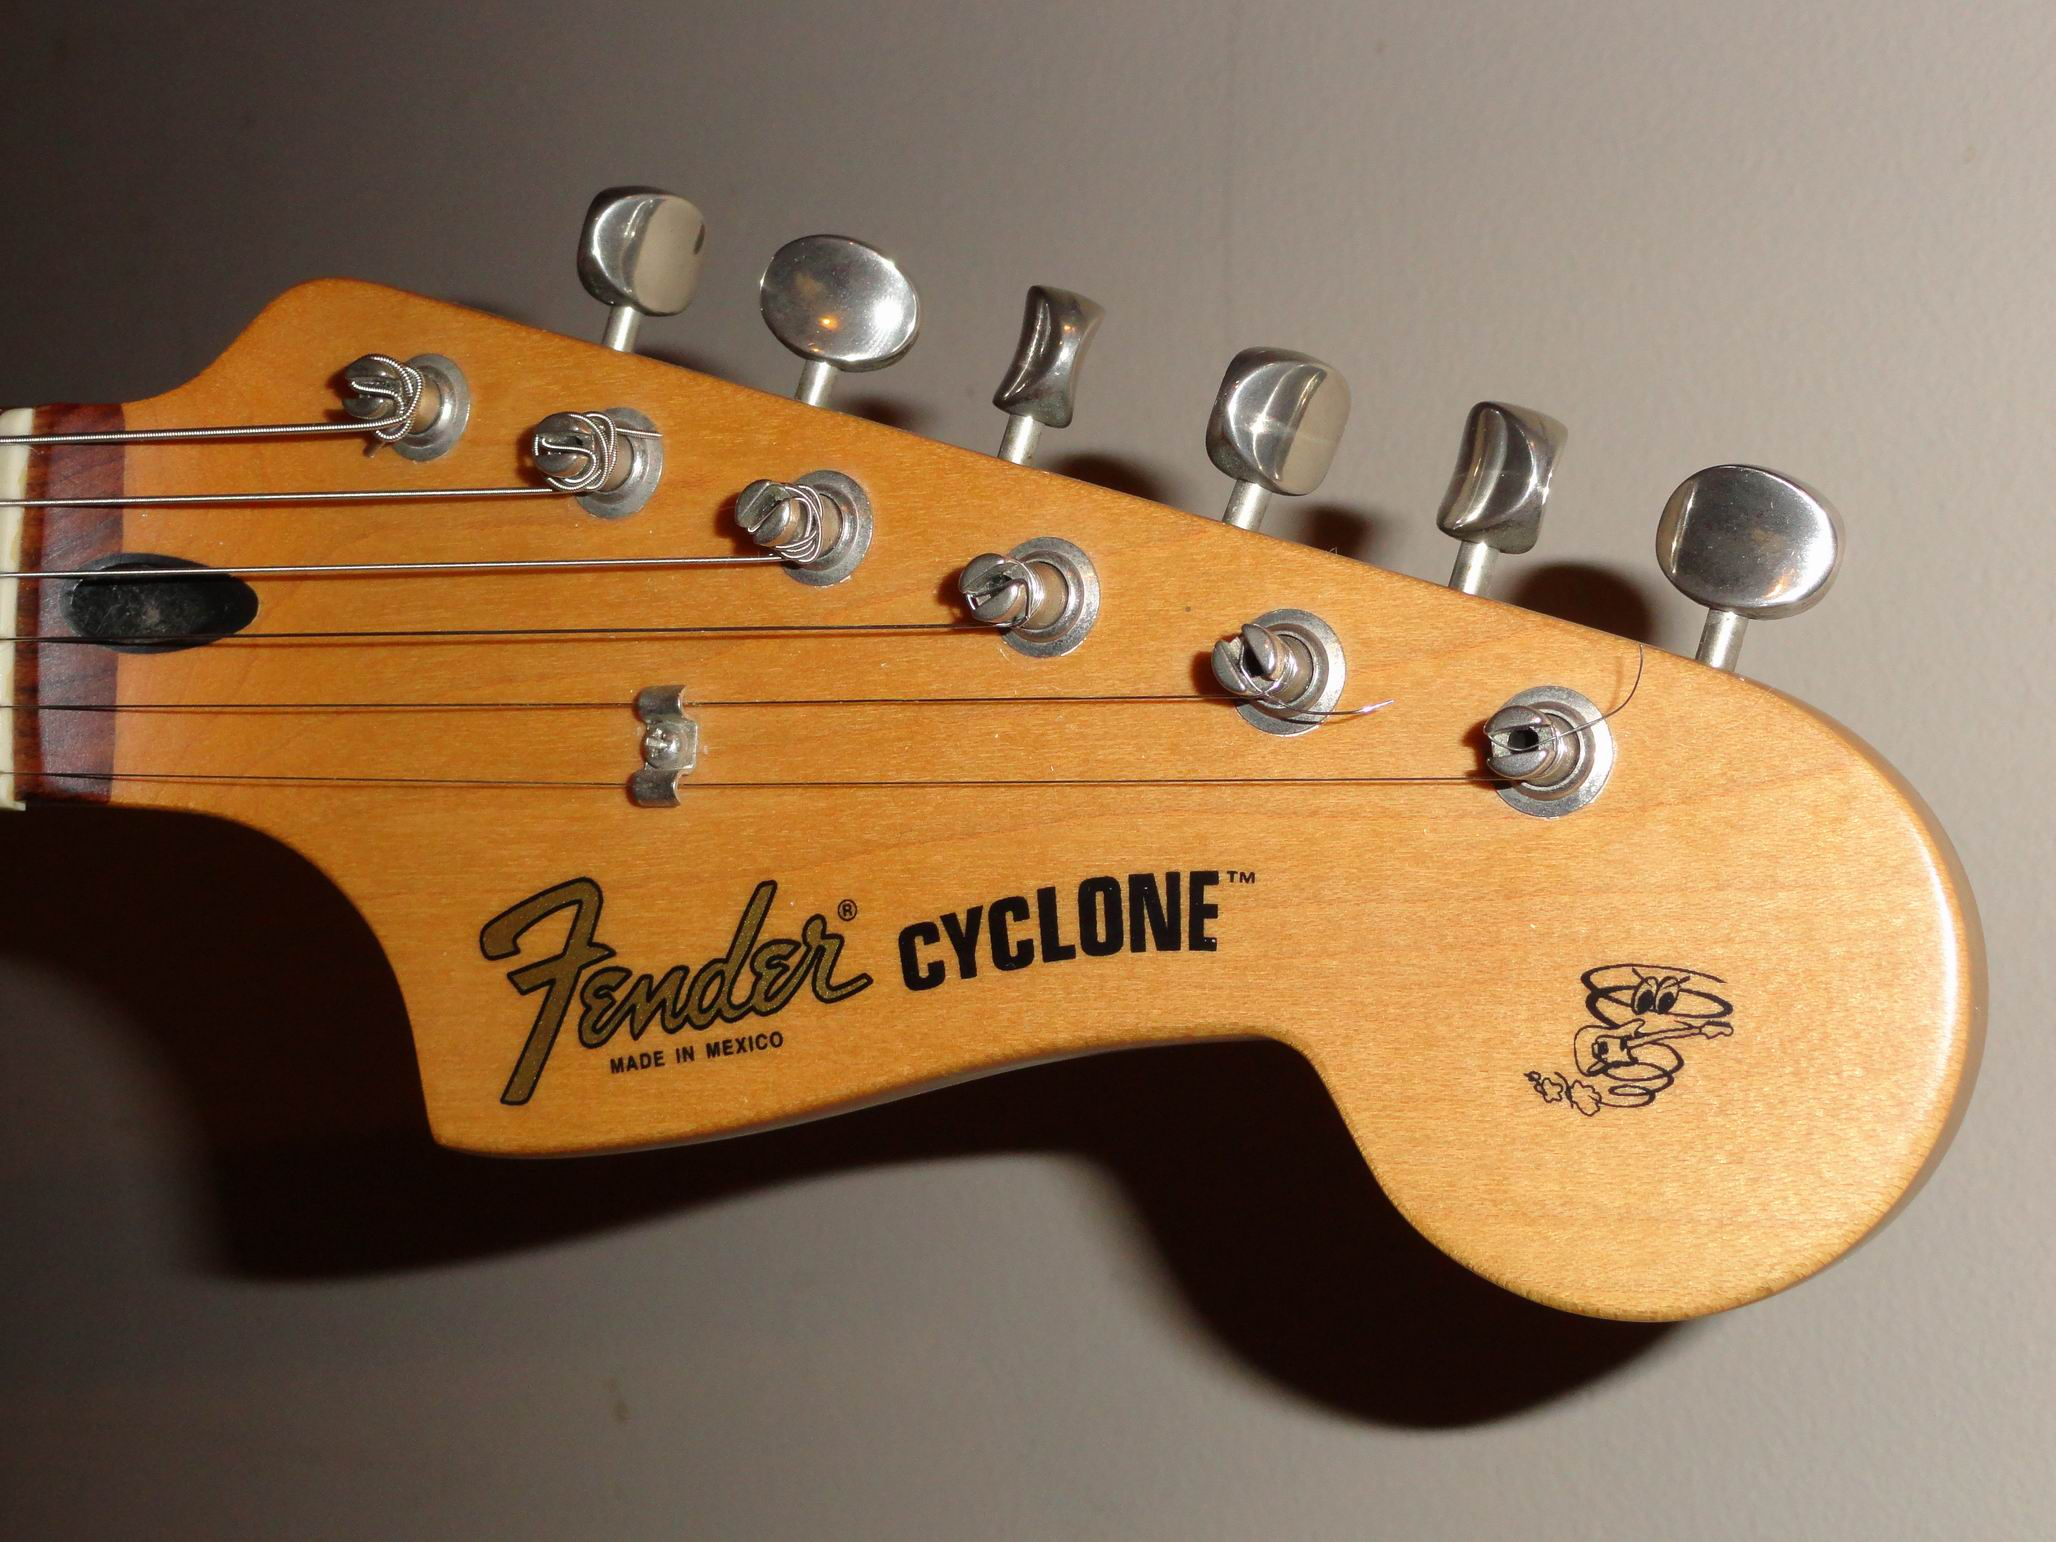 fender 2002 cyclone ii guitar. Black Bedroom Furniture Sets. Home Design Ideas